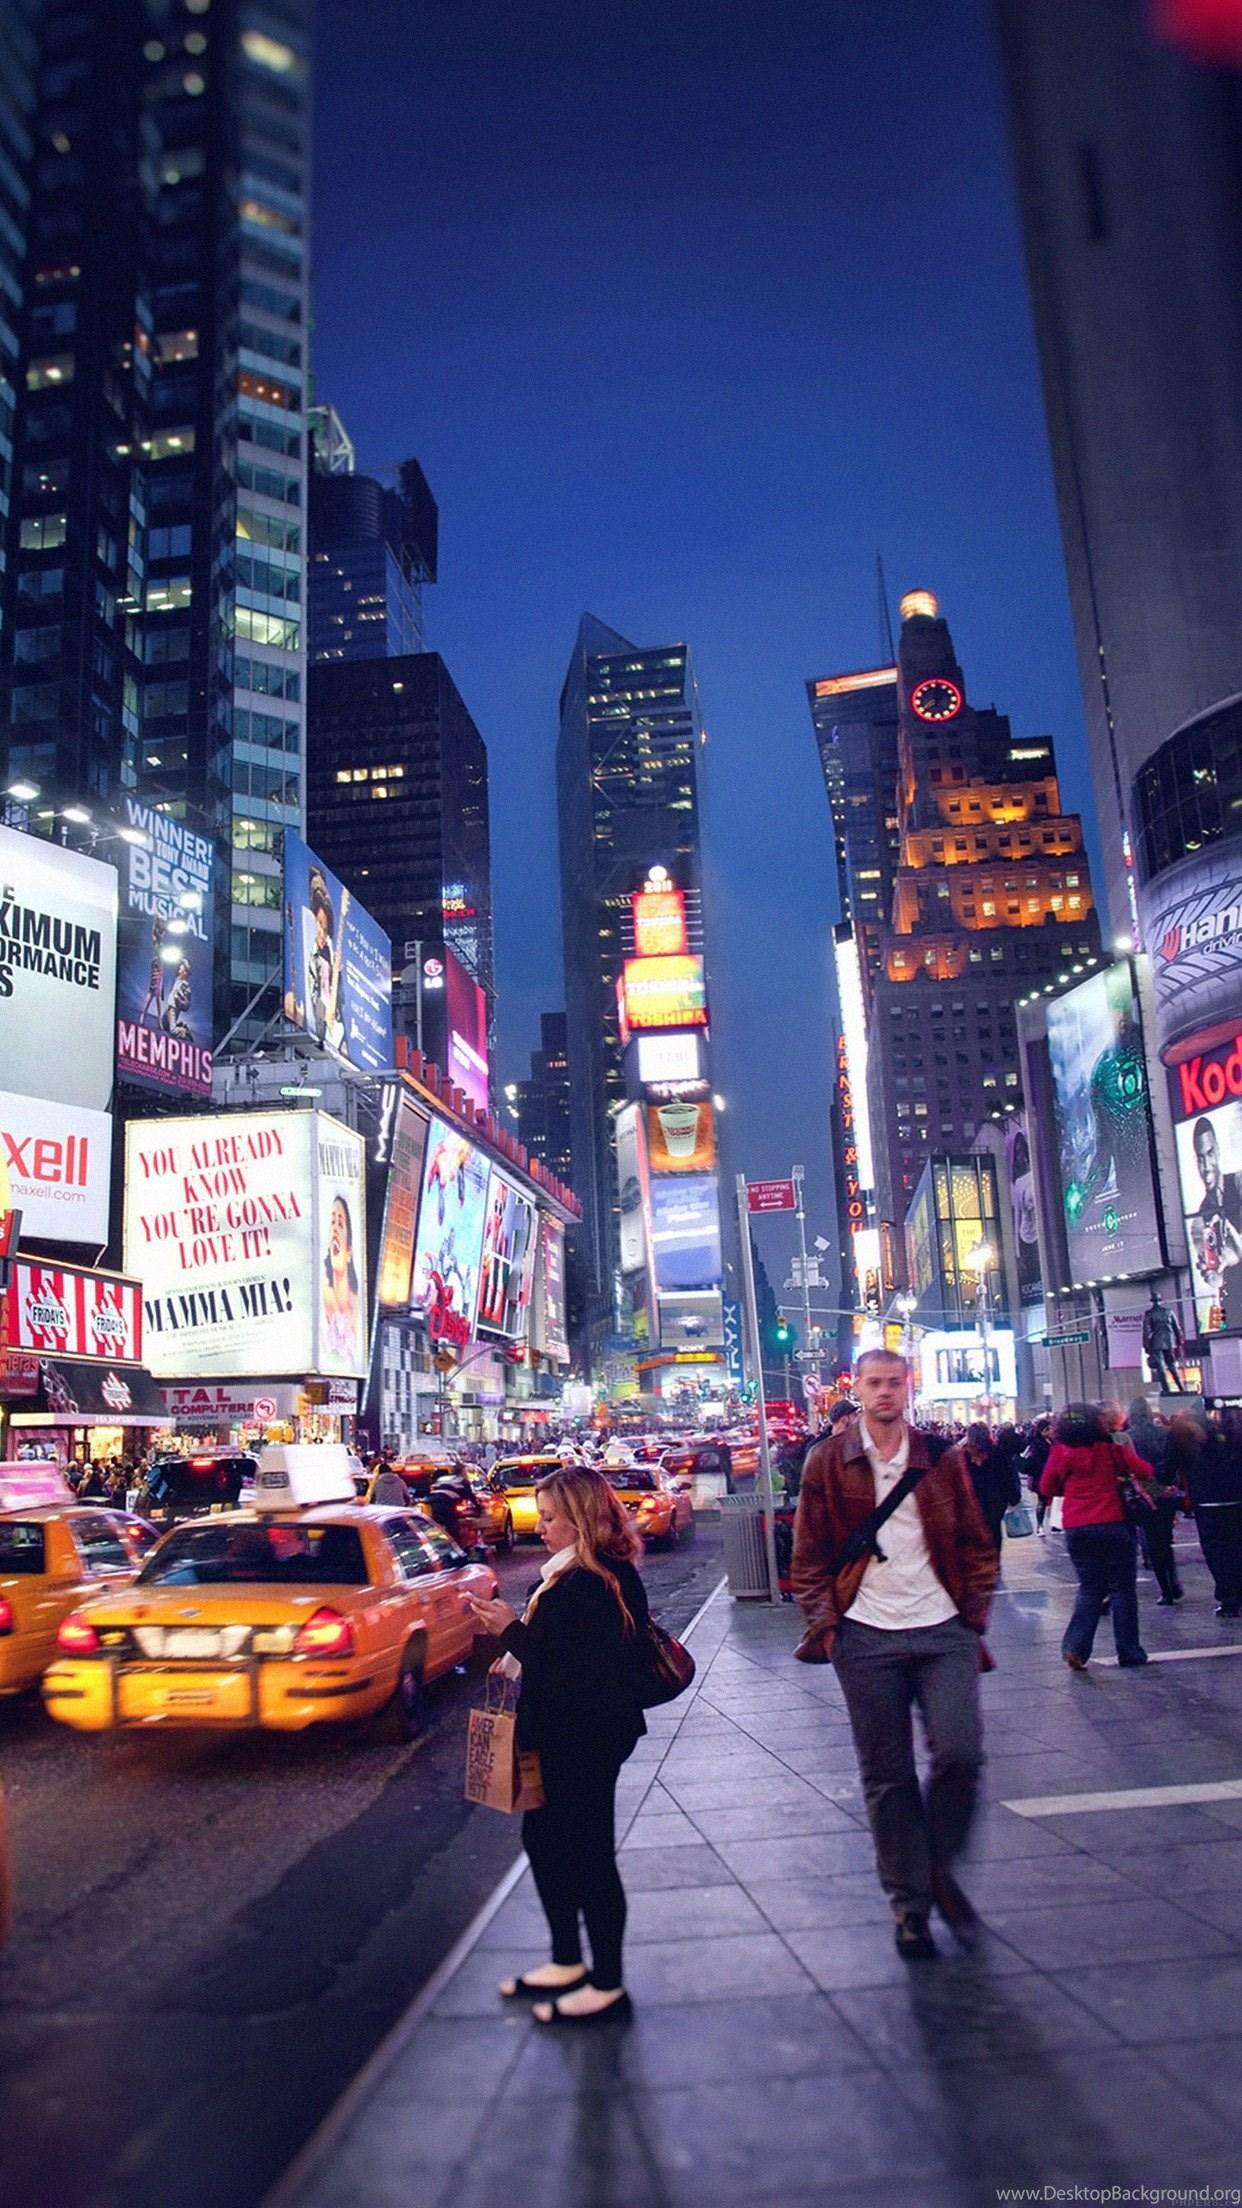 Iphone 6 New York City Super Hd Wallpapers Free Download Desktop Background